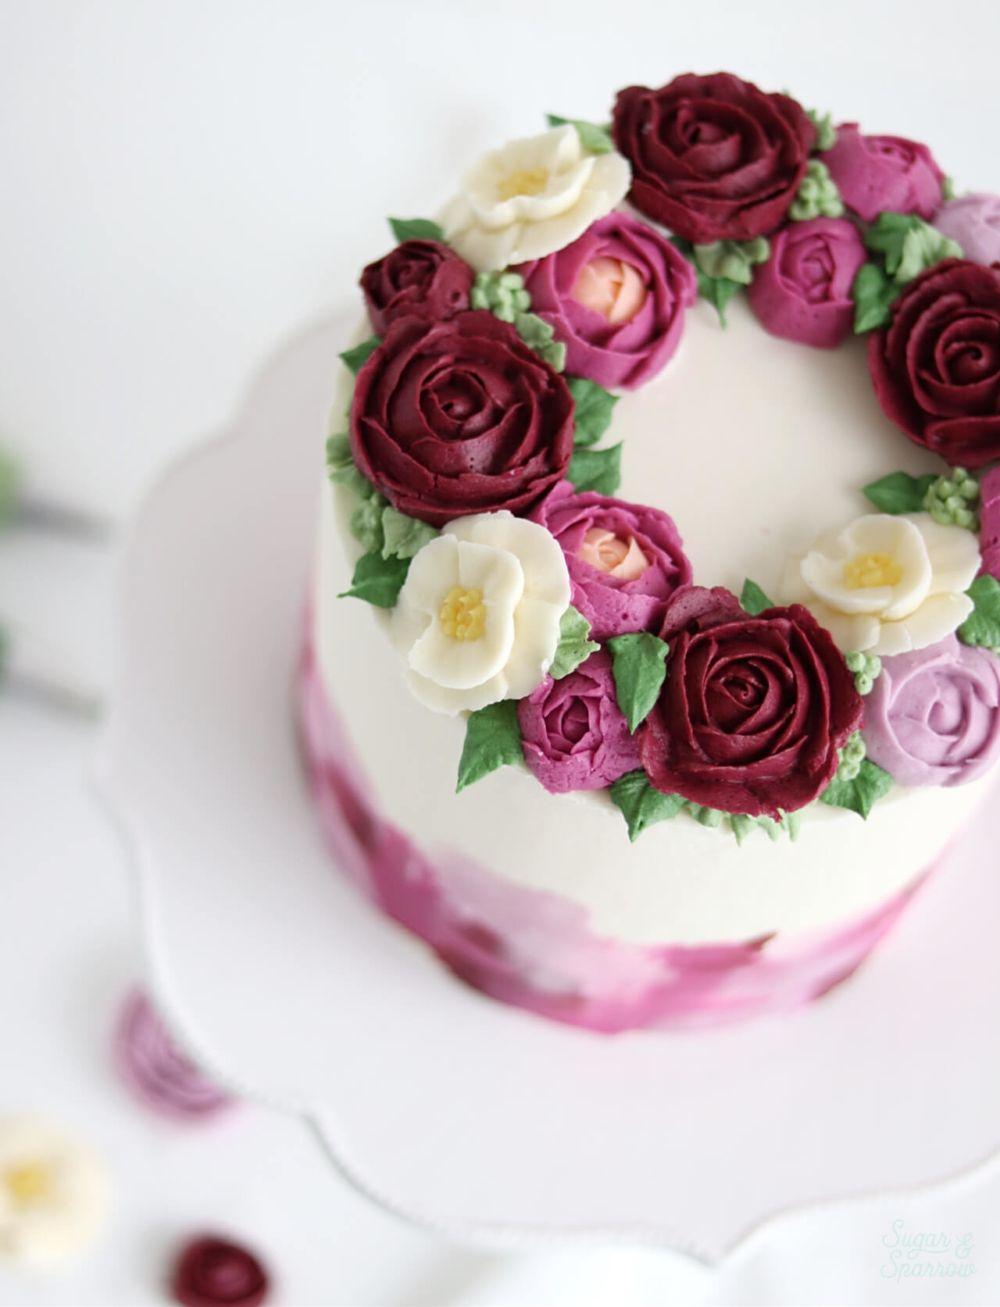 Buttercream Flower Wreath Cake Tutorial - Sugar & Sparrow ...